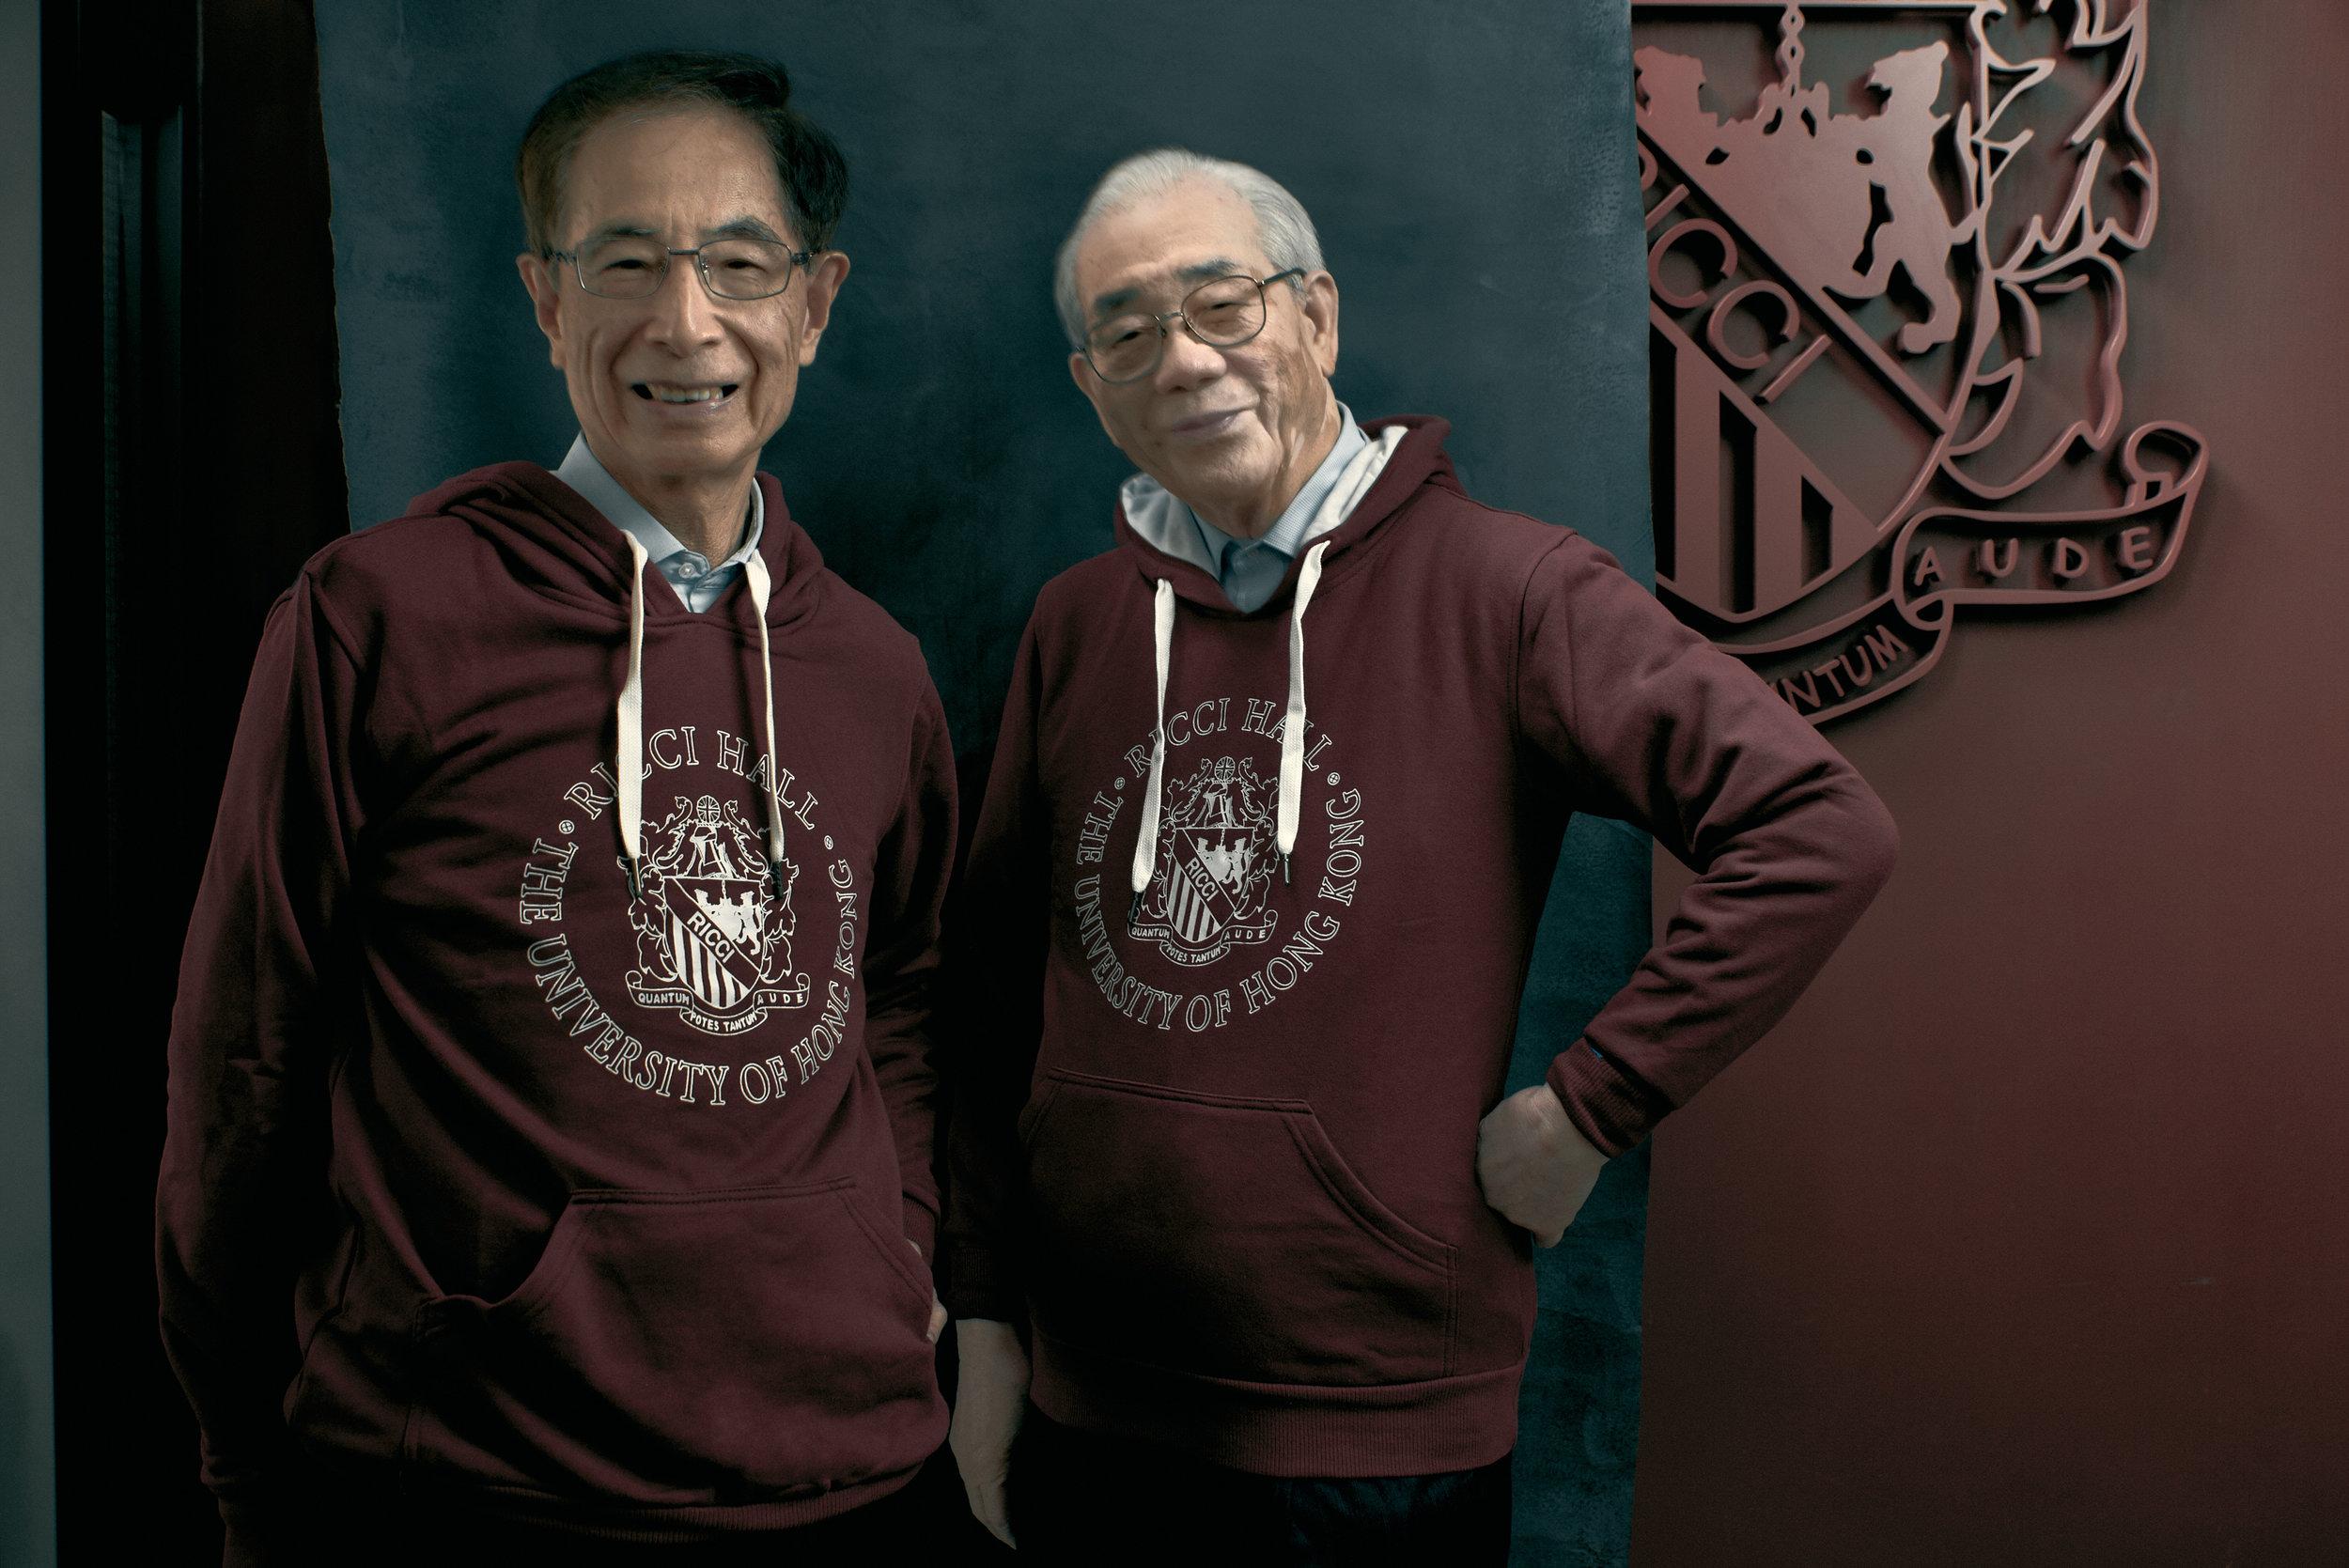 Riccians in the 50s, Ricci Hall Hall Emblem, 24th Feb 2019